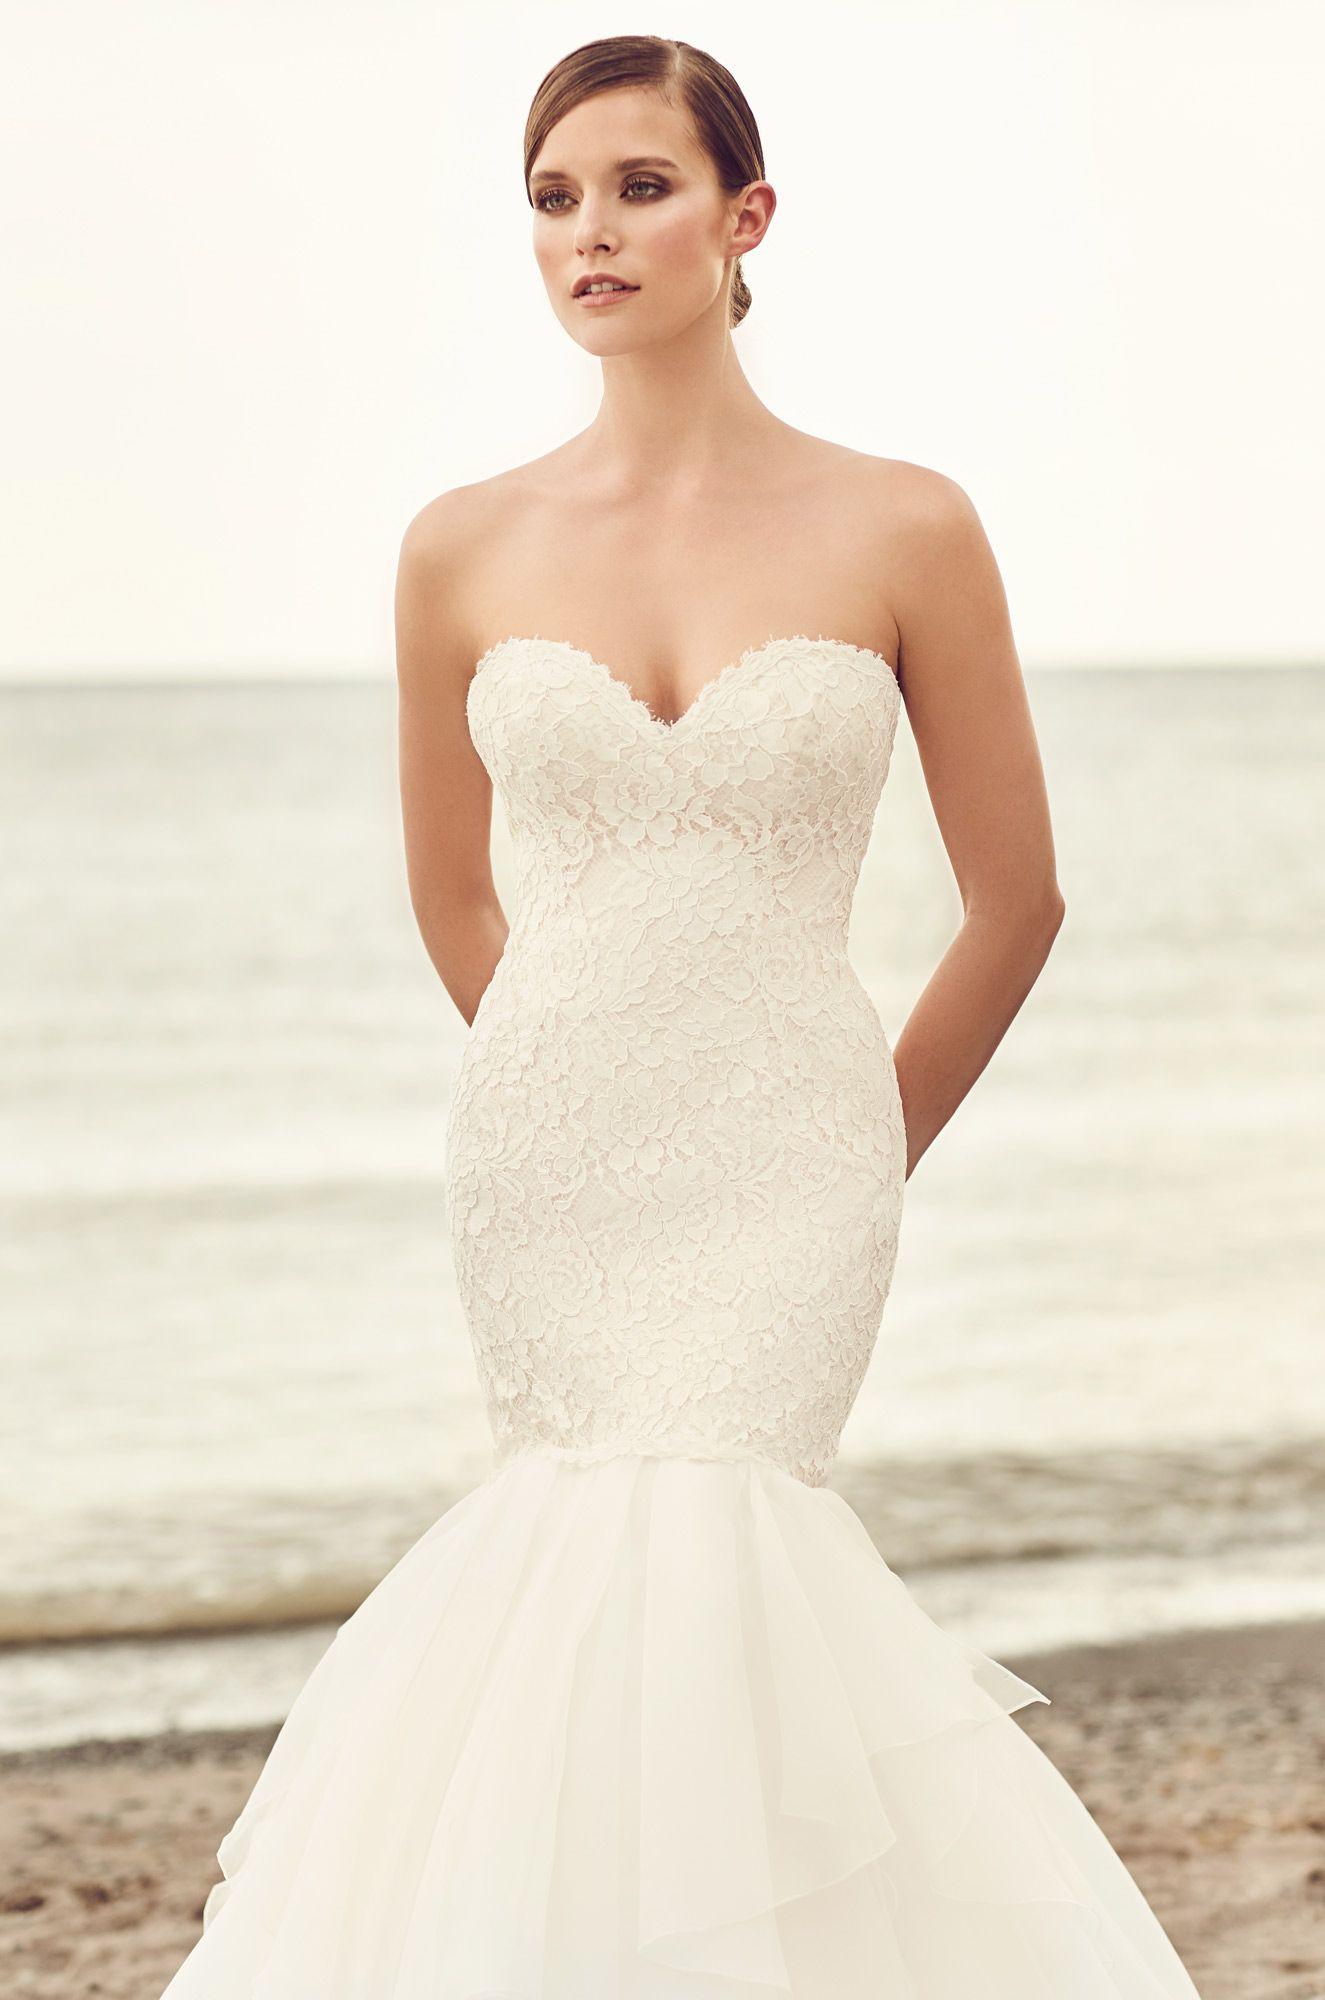 Organza Trumpet Skirt Wedding Dress - Style #2109   Organza wedding ...